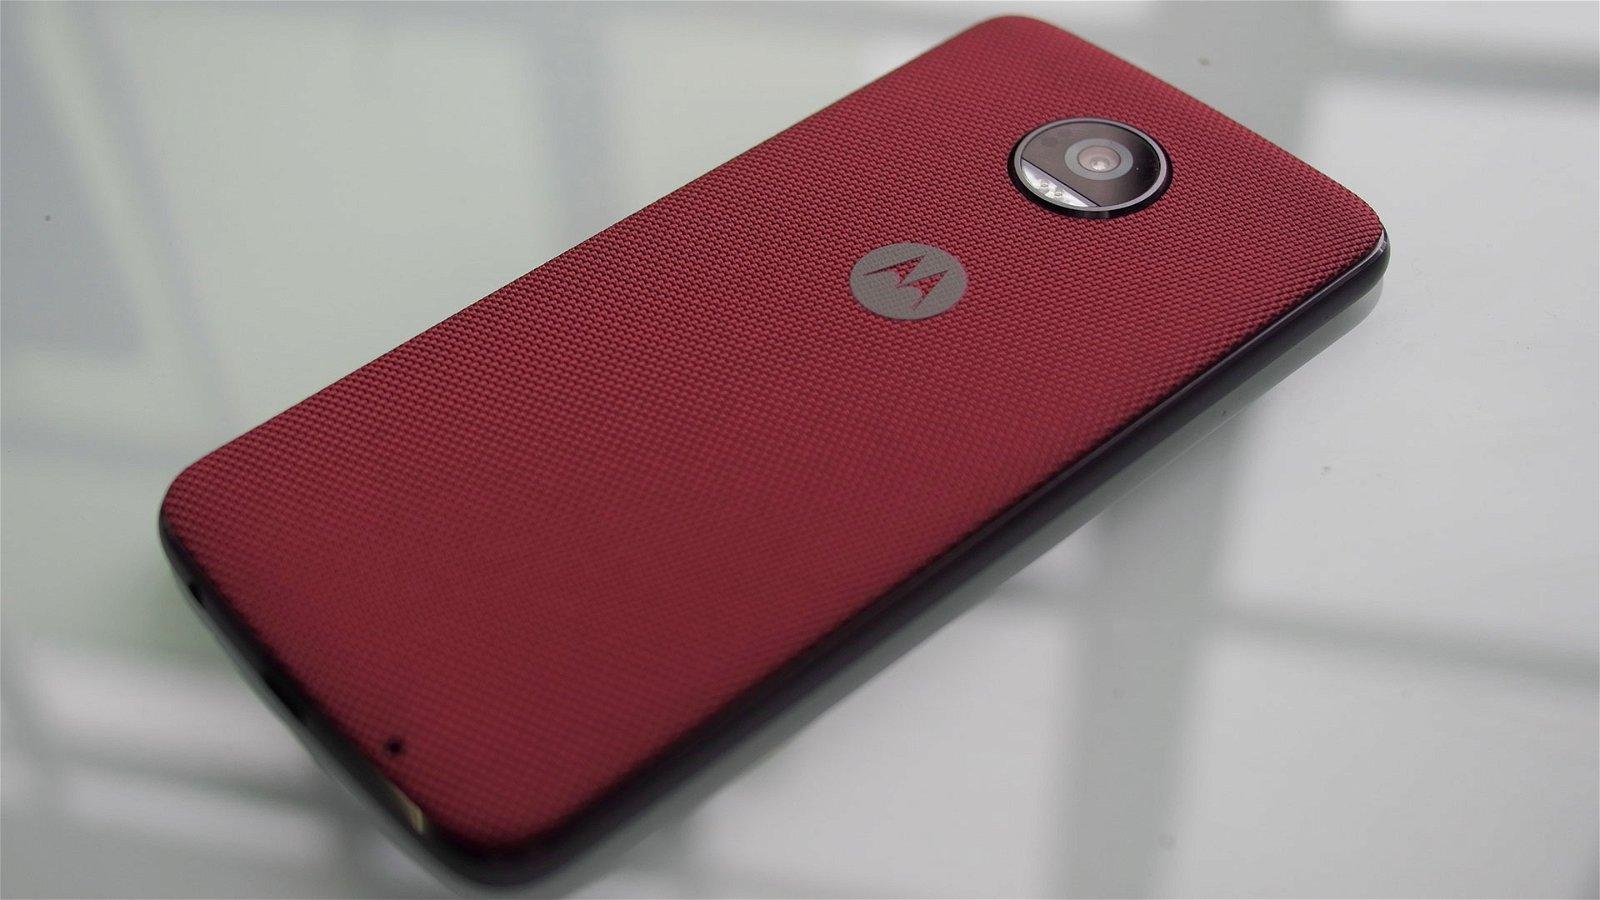 Motorola Moto Z2 Play (Smartphone) Review 3